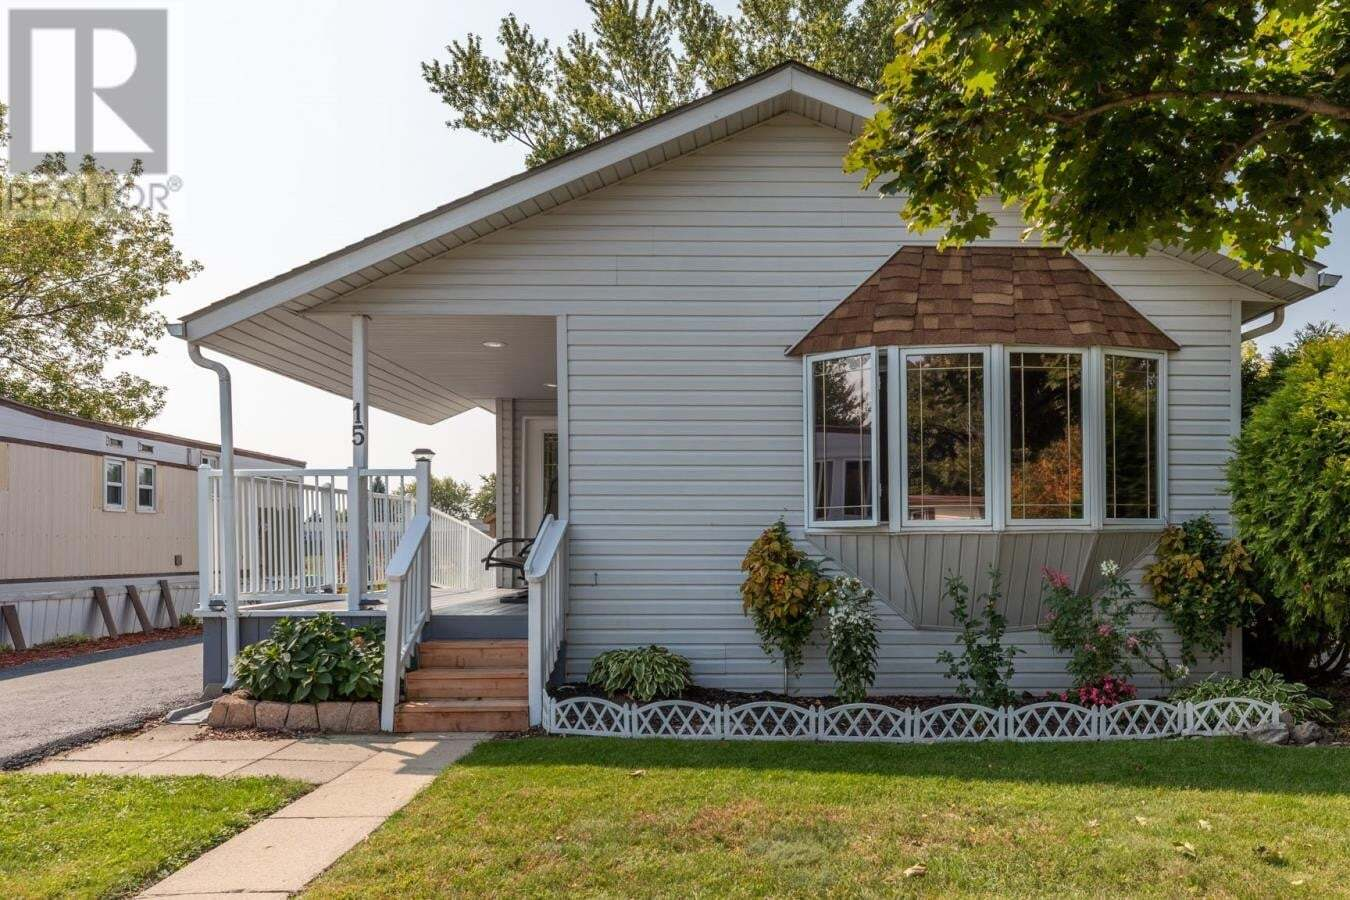 House for sale at 15 Malden Hl Amherstburg Ontario - MLS: 20012693